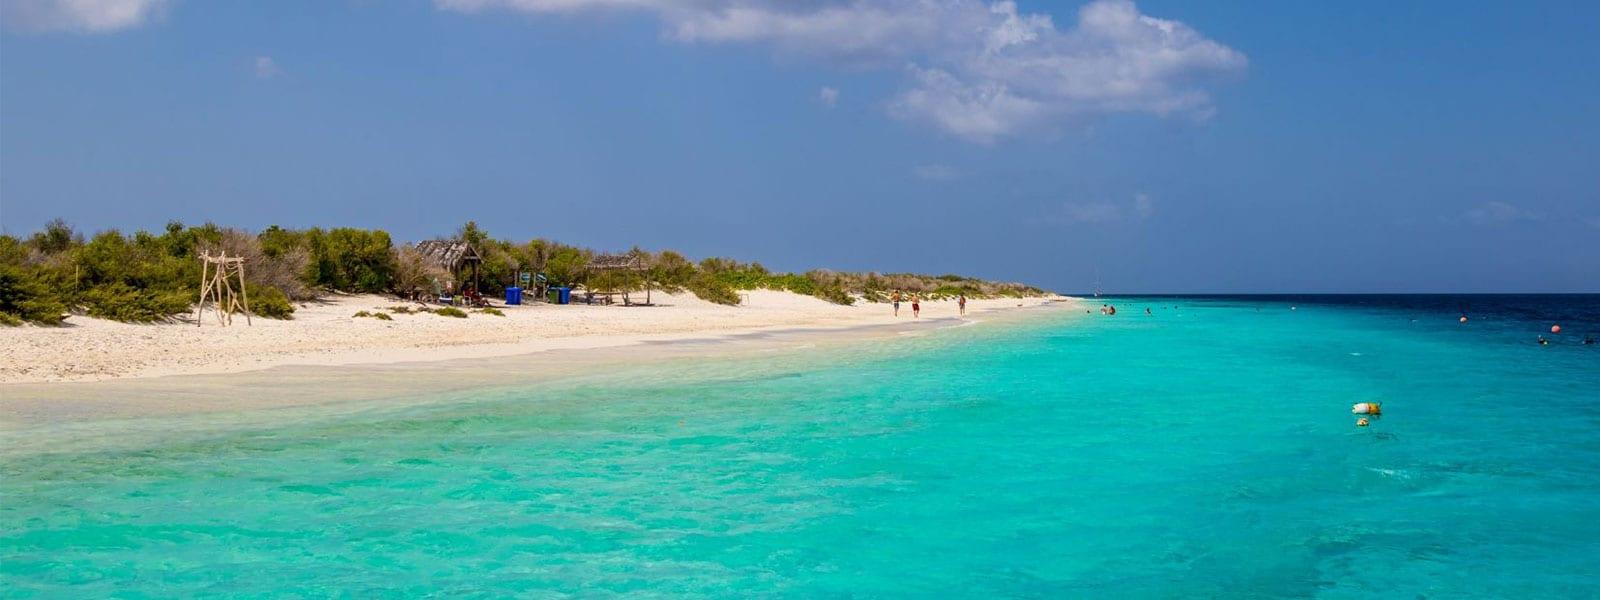 Tip Bonaire, relaxen op dit strand, No Name Beach strand op Klein Bonaire